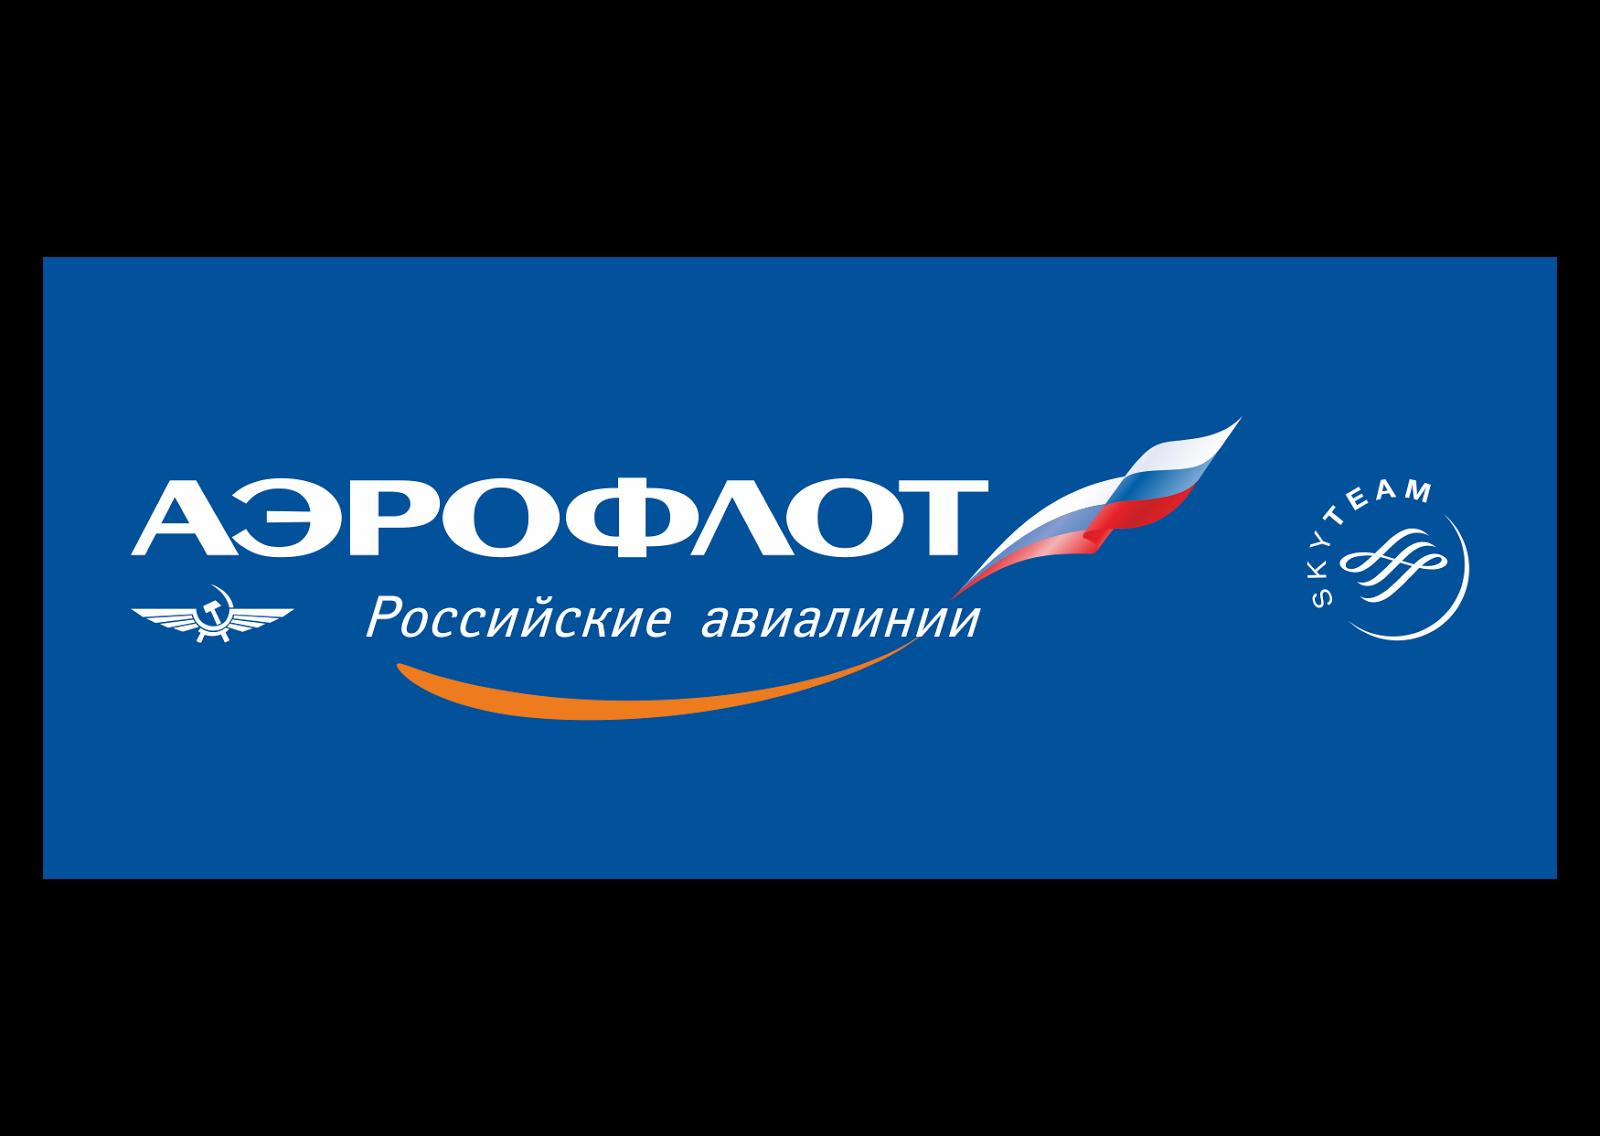 Aeroflot Russian Airlines Logo Vector - Aeroflot Vector PNG